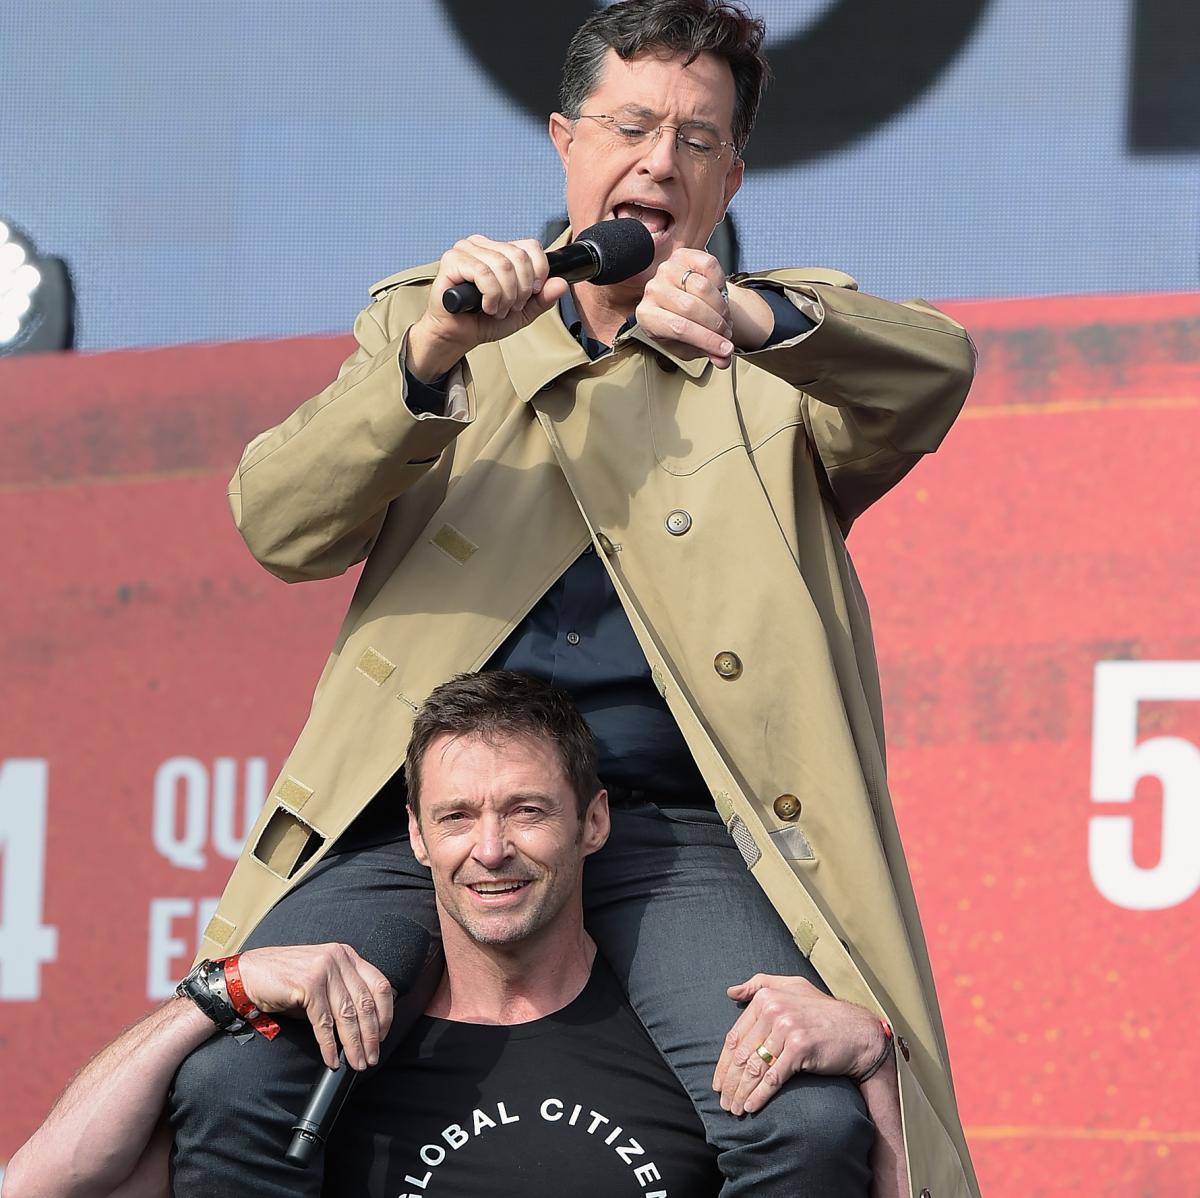 2015 Global Citizens Festival Stephen Colbert and Hugh Jackman